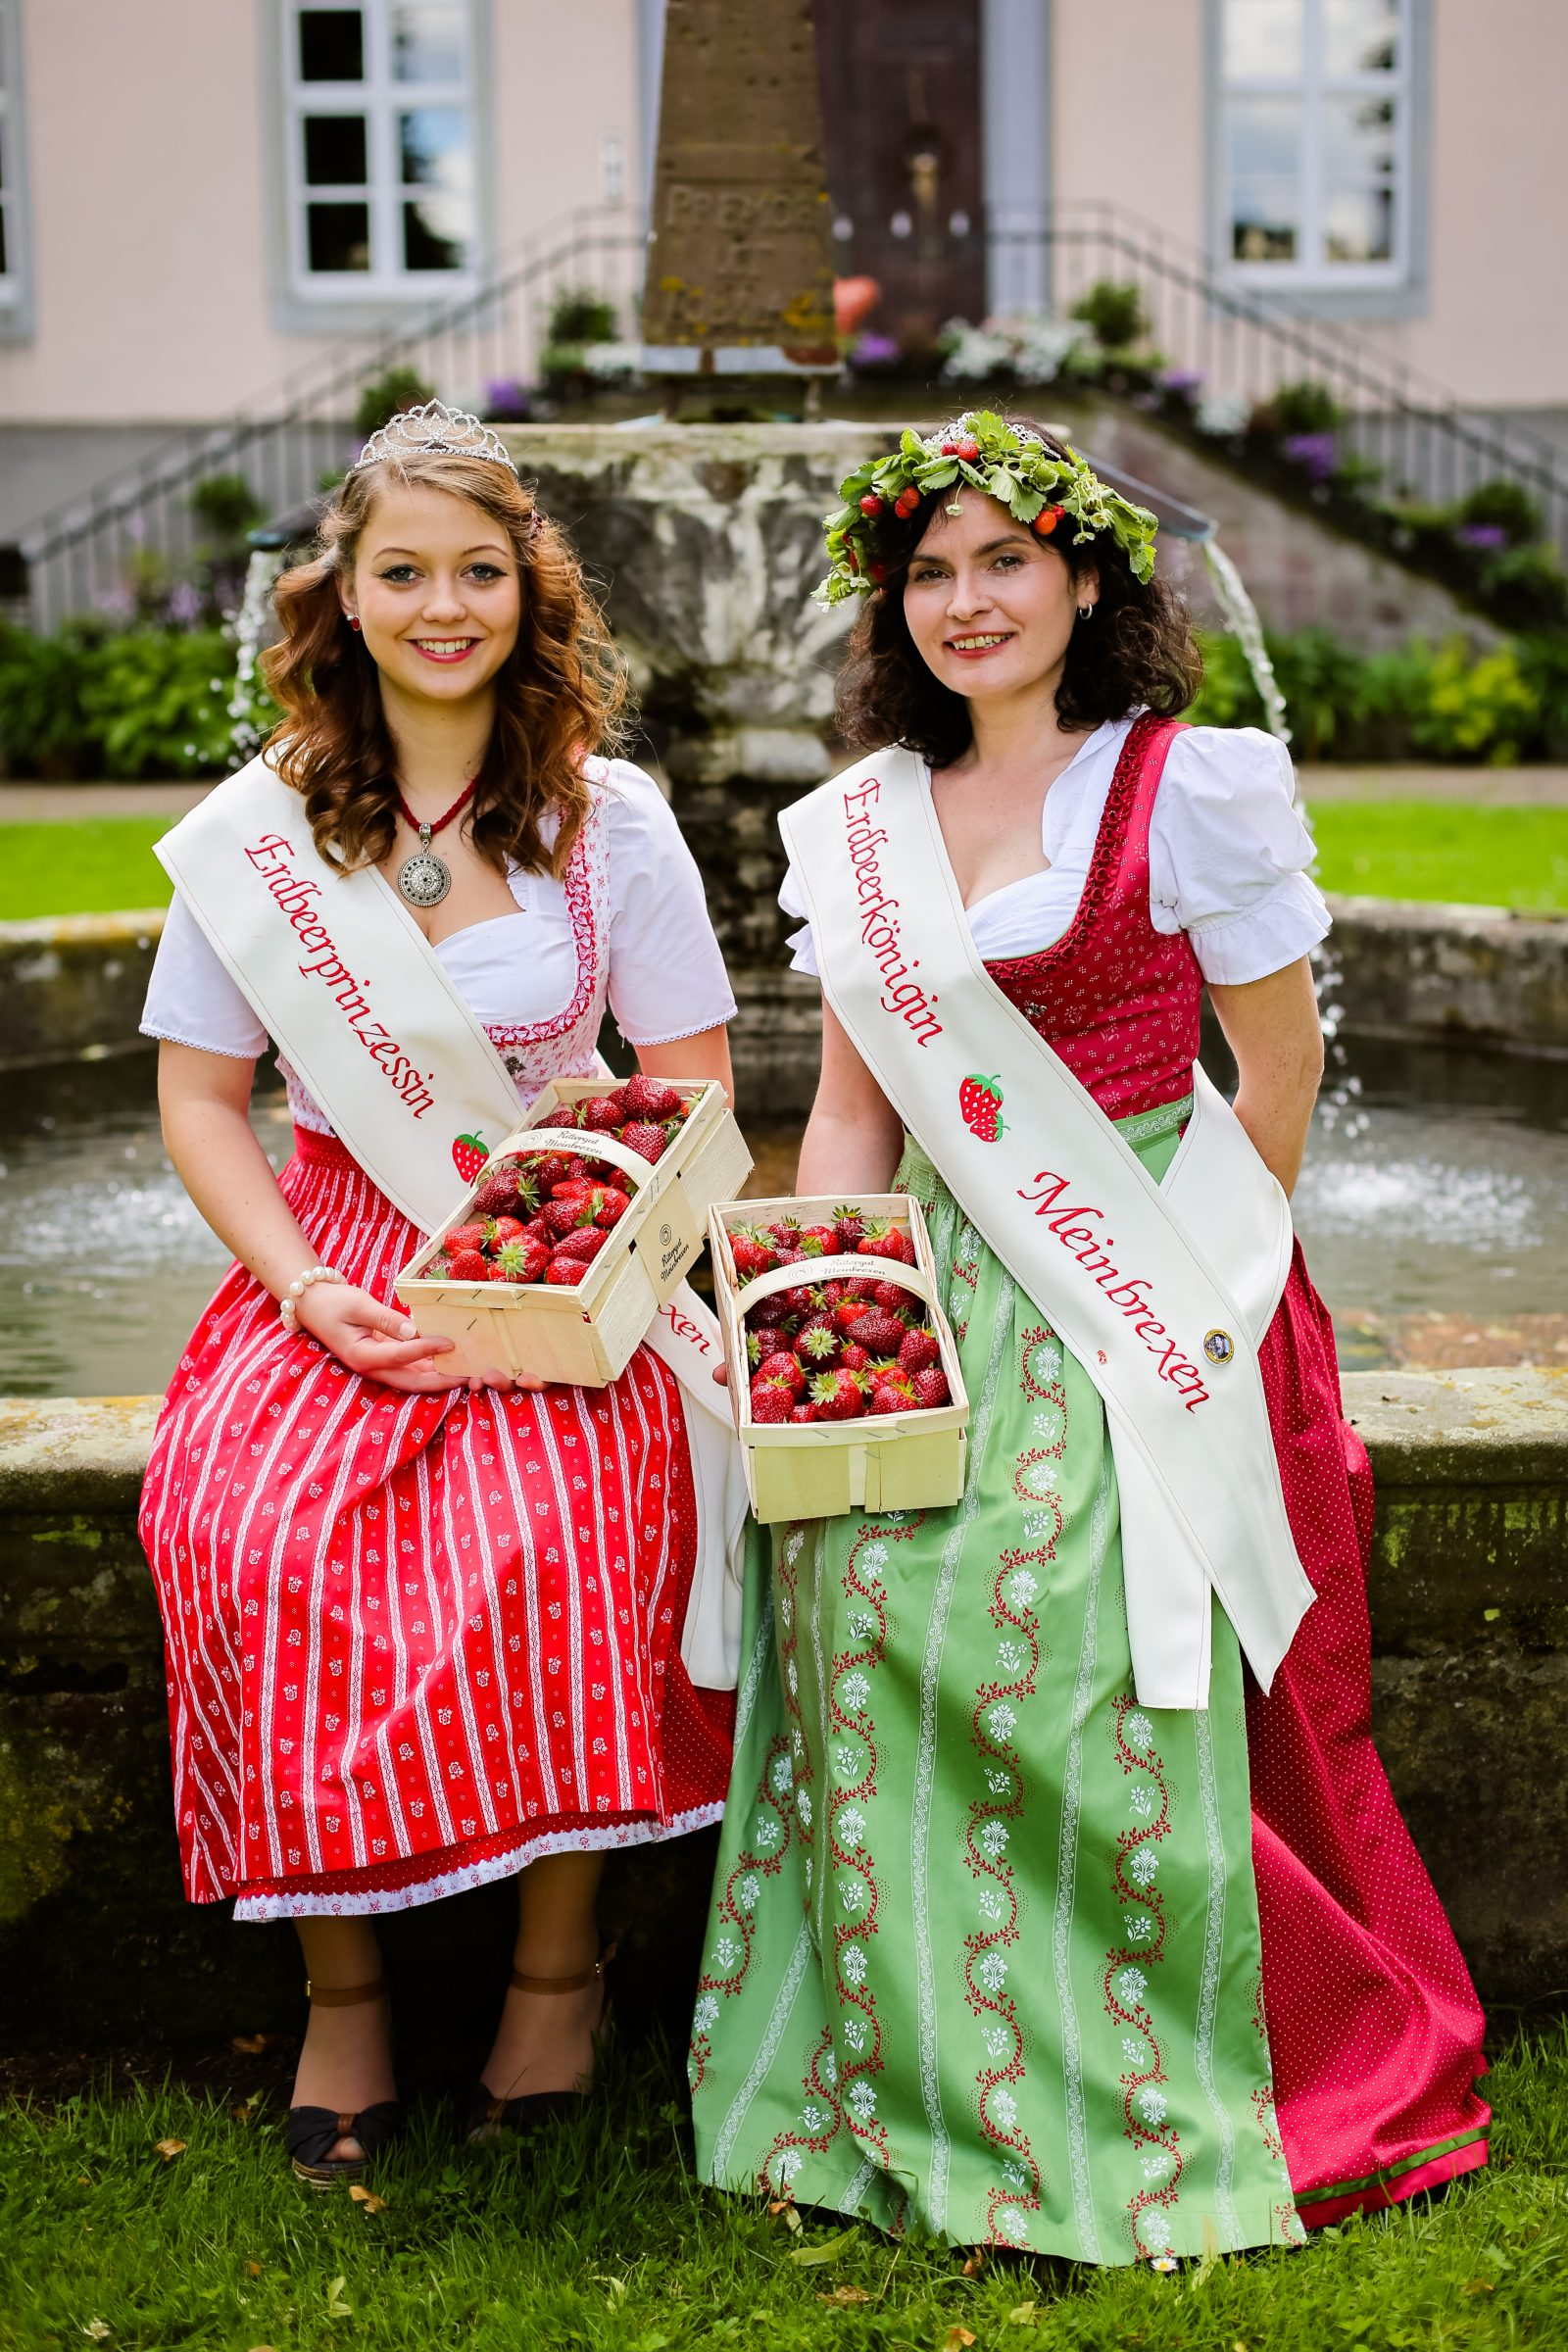 Erdbeeren vom Rittergut Meinbrexen